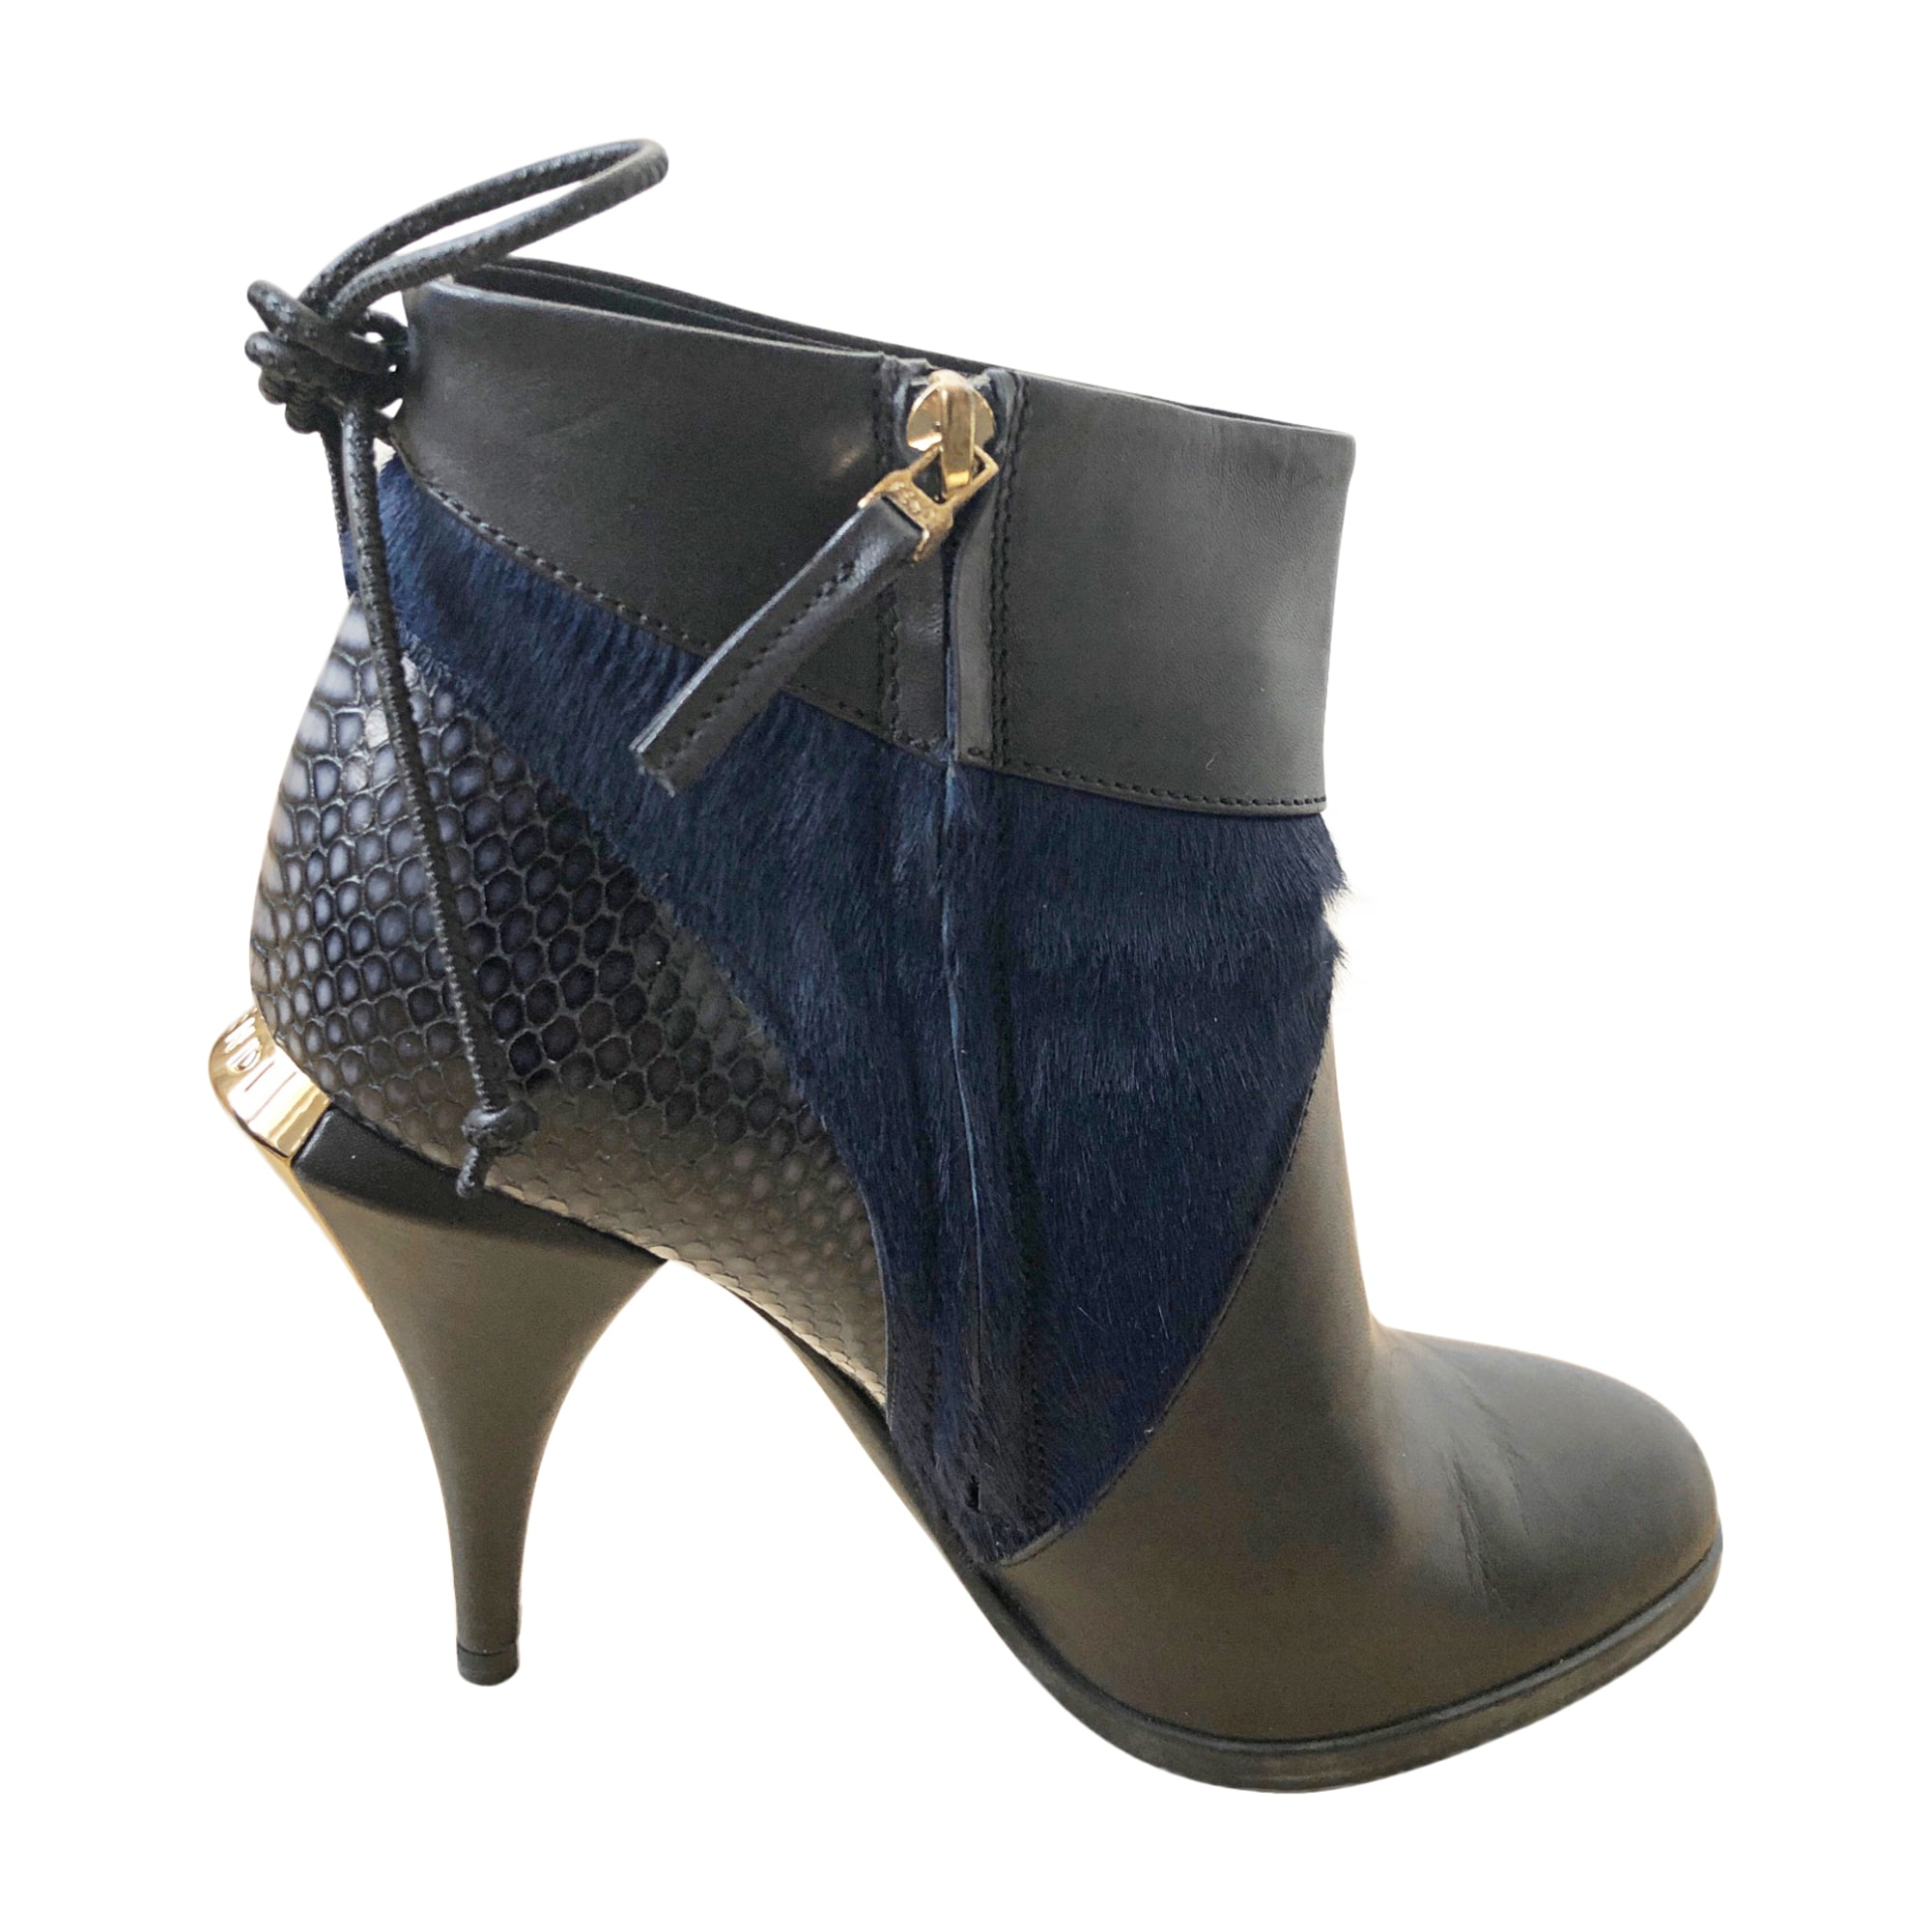 High Heel Ankle Boots FENDI Multicolor